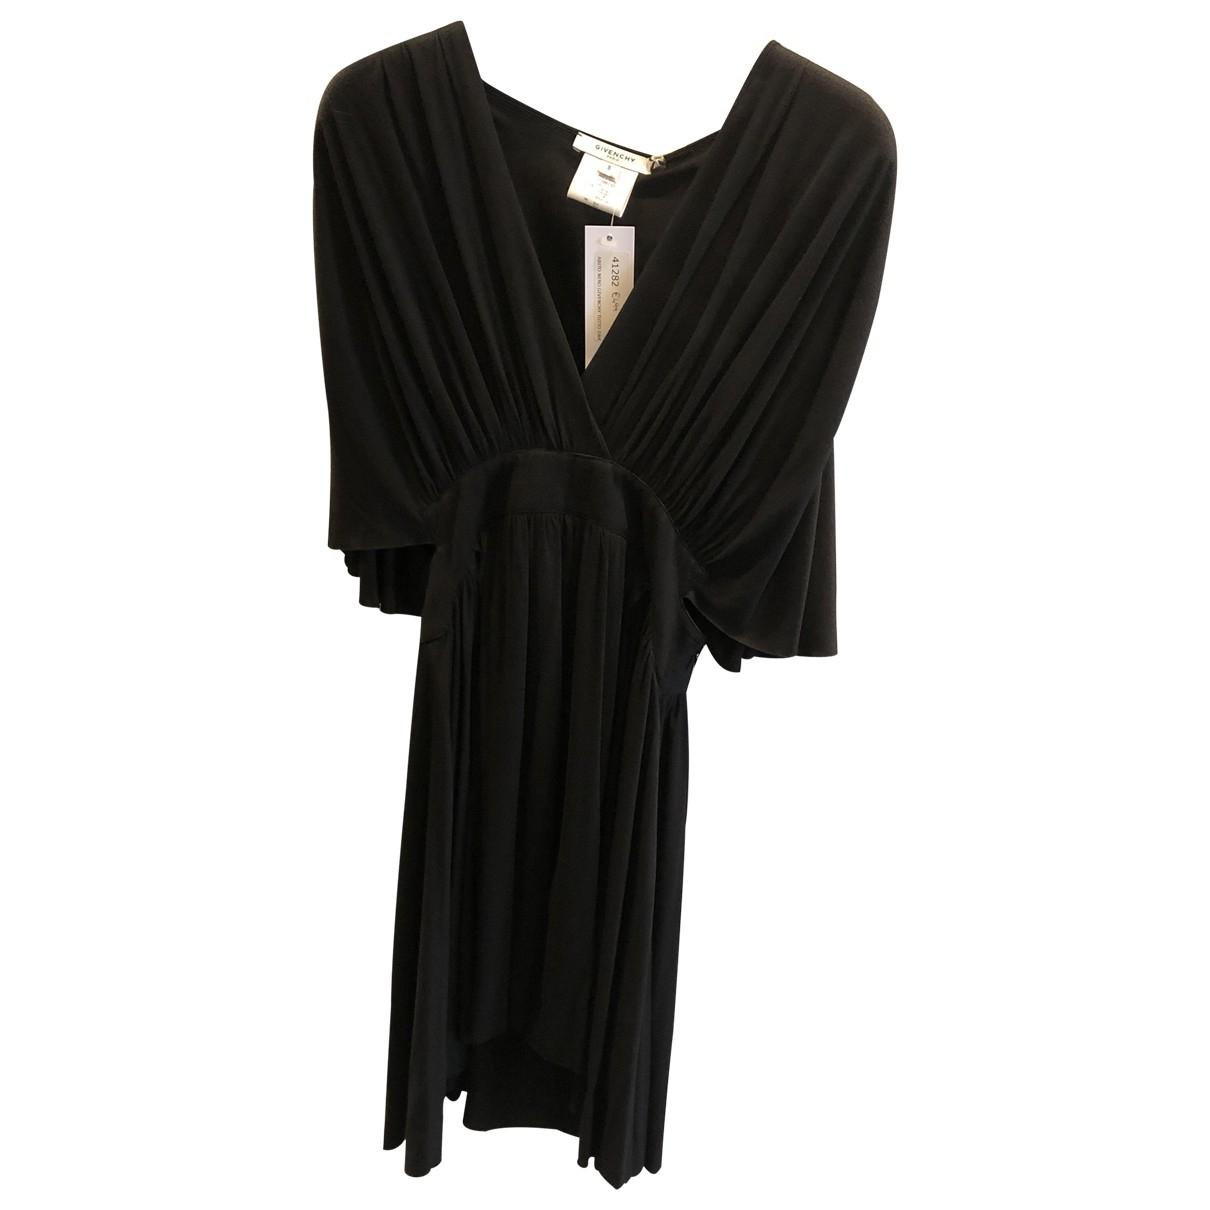 Givenchy \N Black Cotton dress for Women XS International